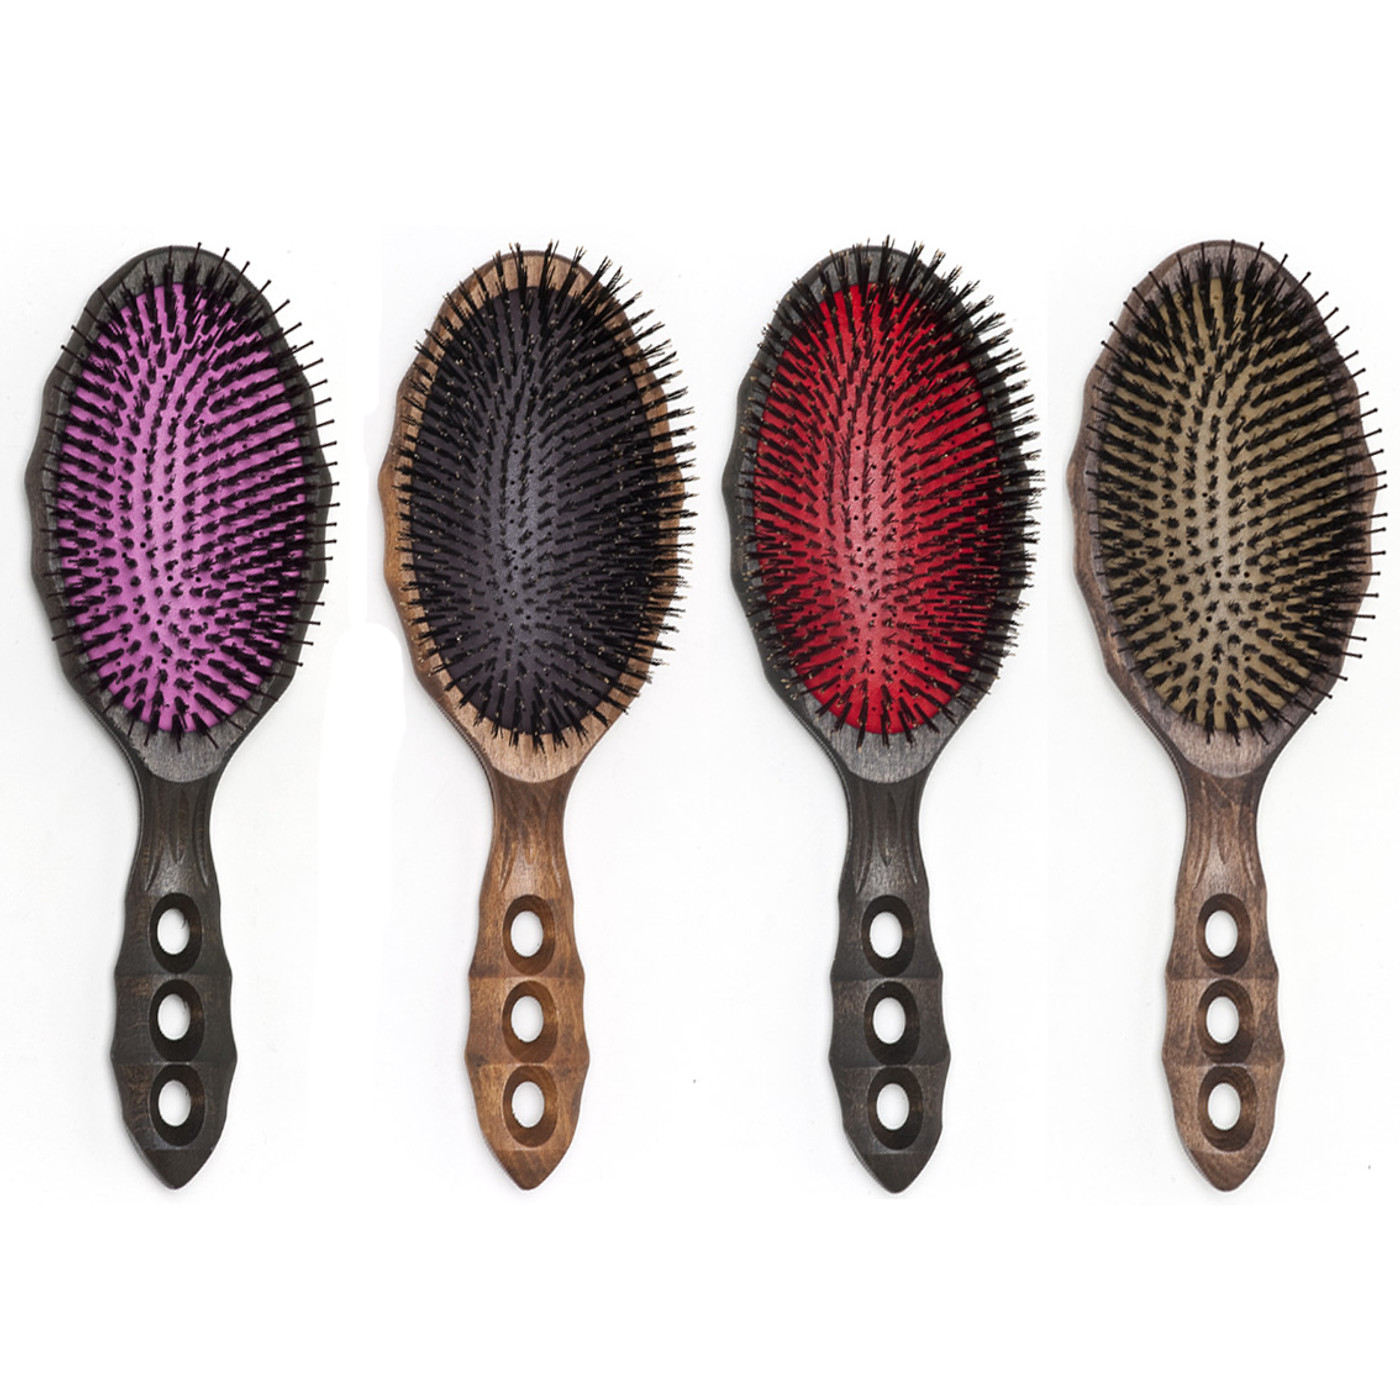 YS Park Tortoise Hairbrush Range